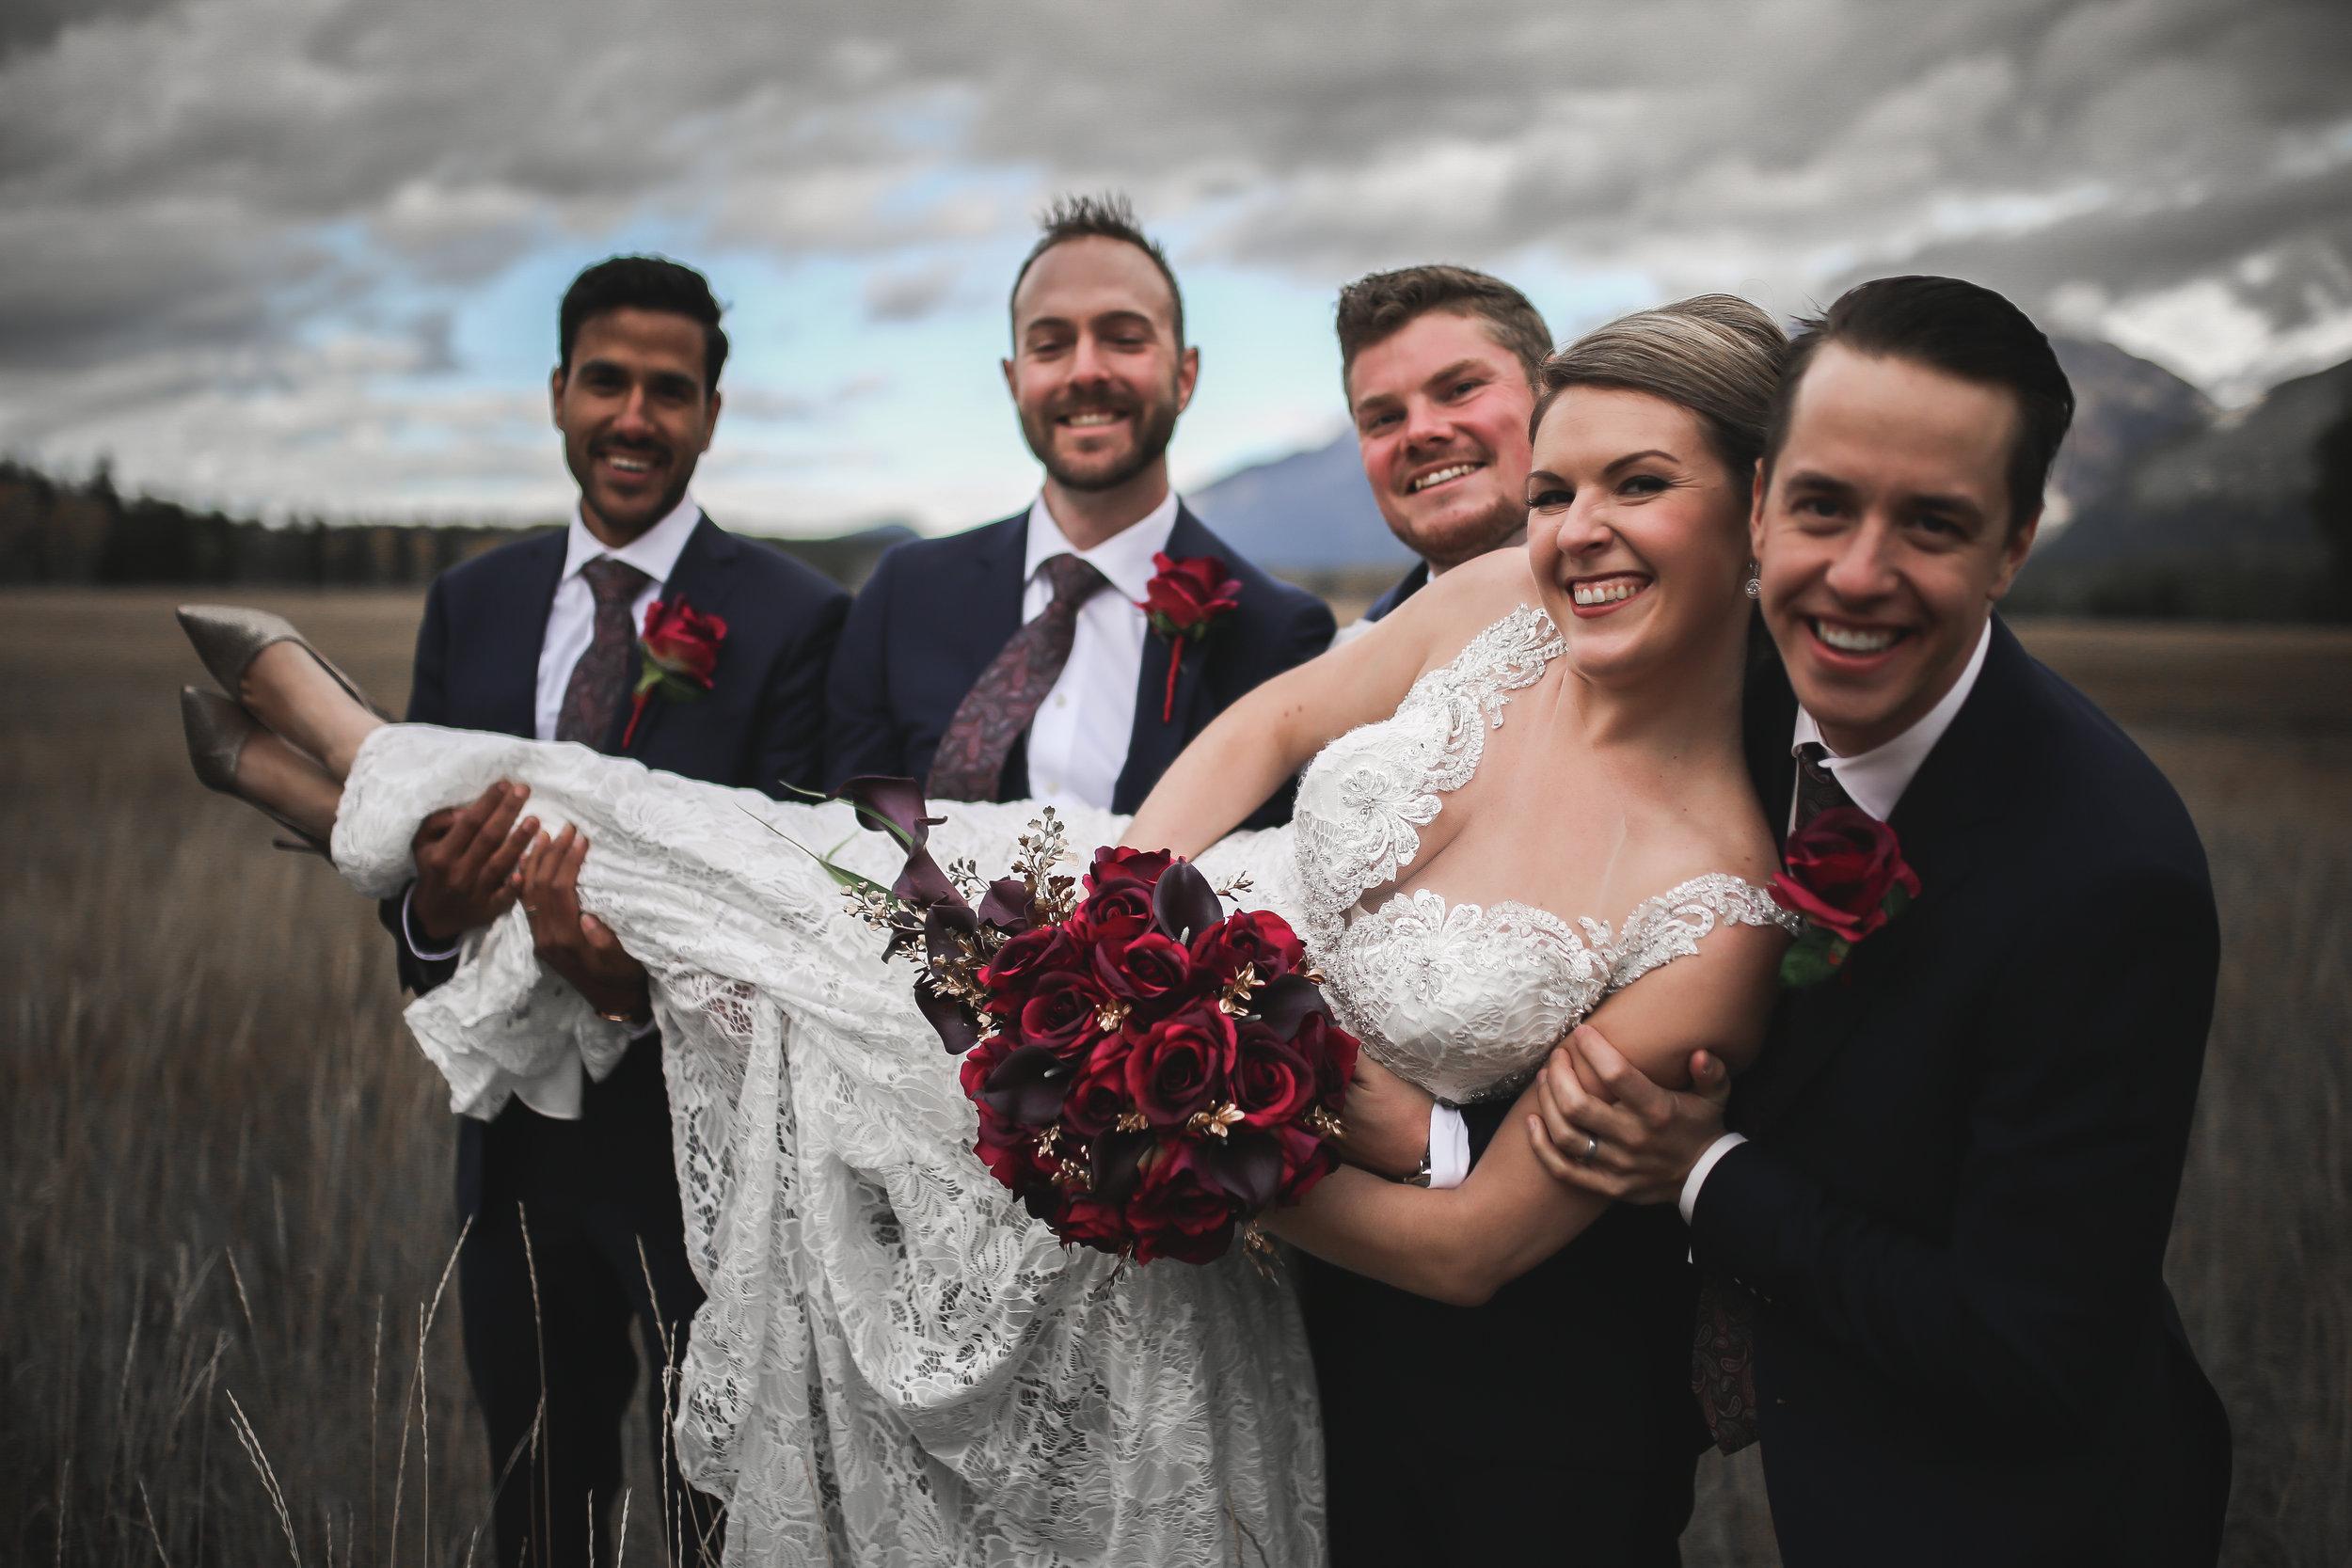 03 Adam Ziorio Photography - Vitoria wedding photographer Nick&Bree Fernie Wedding.jpg